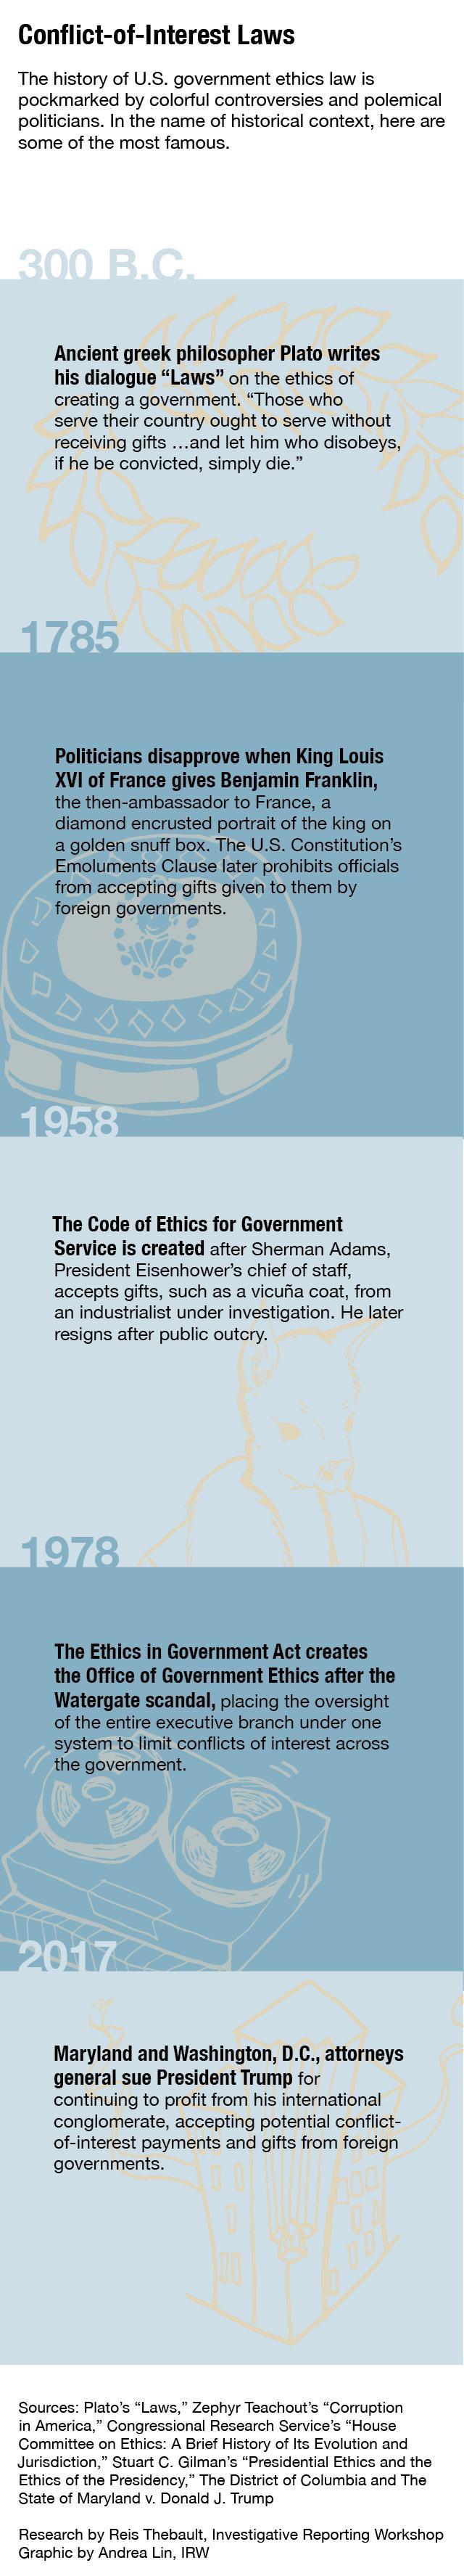 ethics timeline